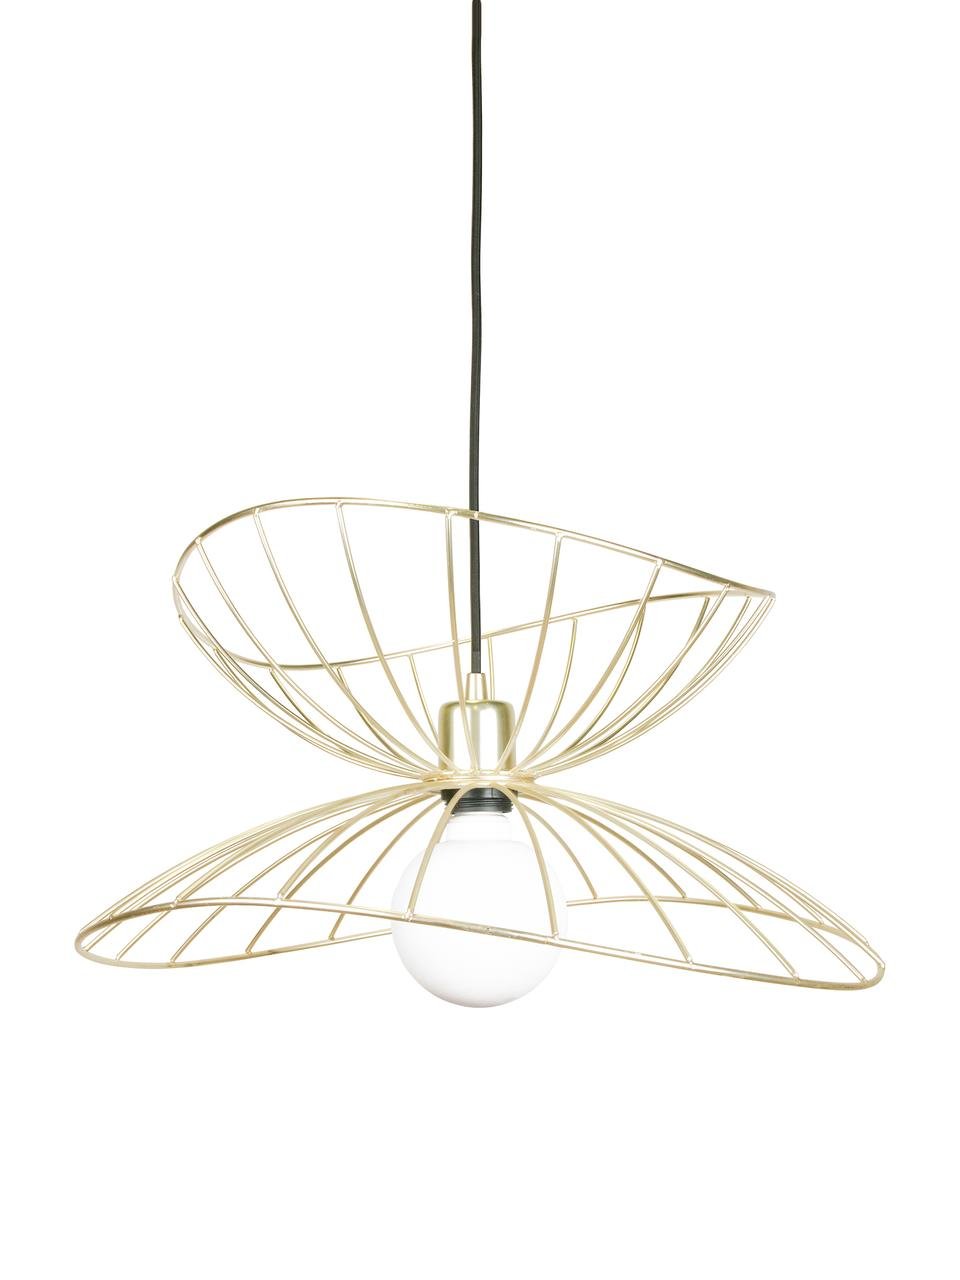 Hanglamp Ray, Lampenkap: vermessingd metaal en geb, Baldakijn: gelakt metaal, Geborsteld messingkleurig, Ø 70 cm